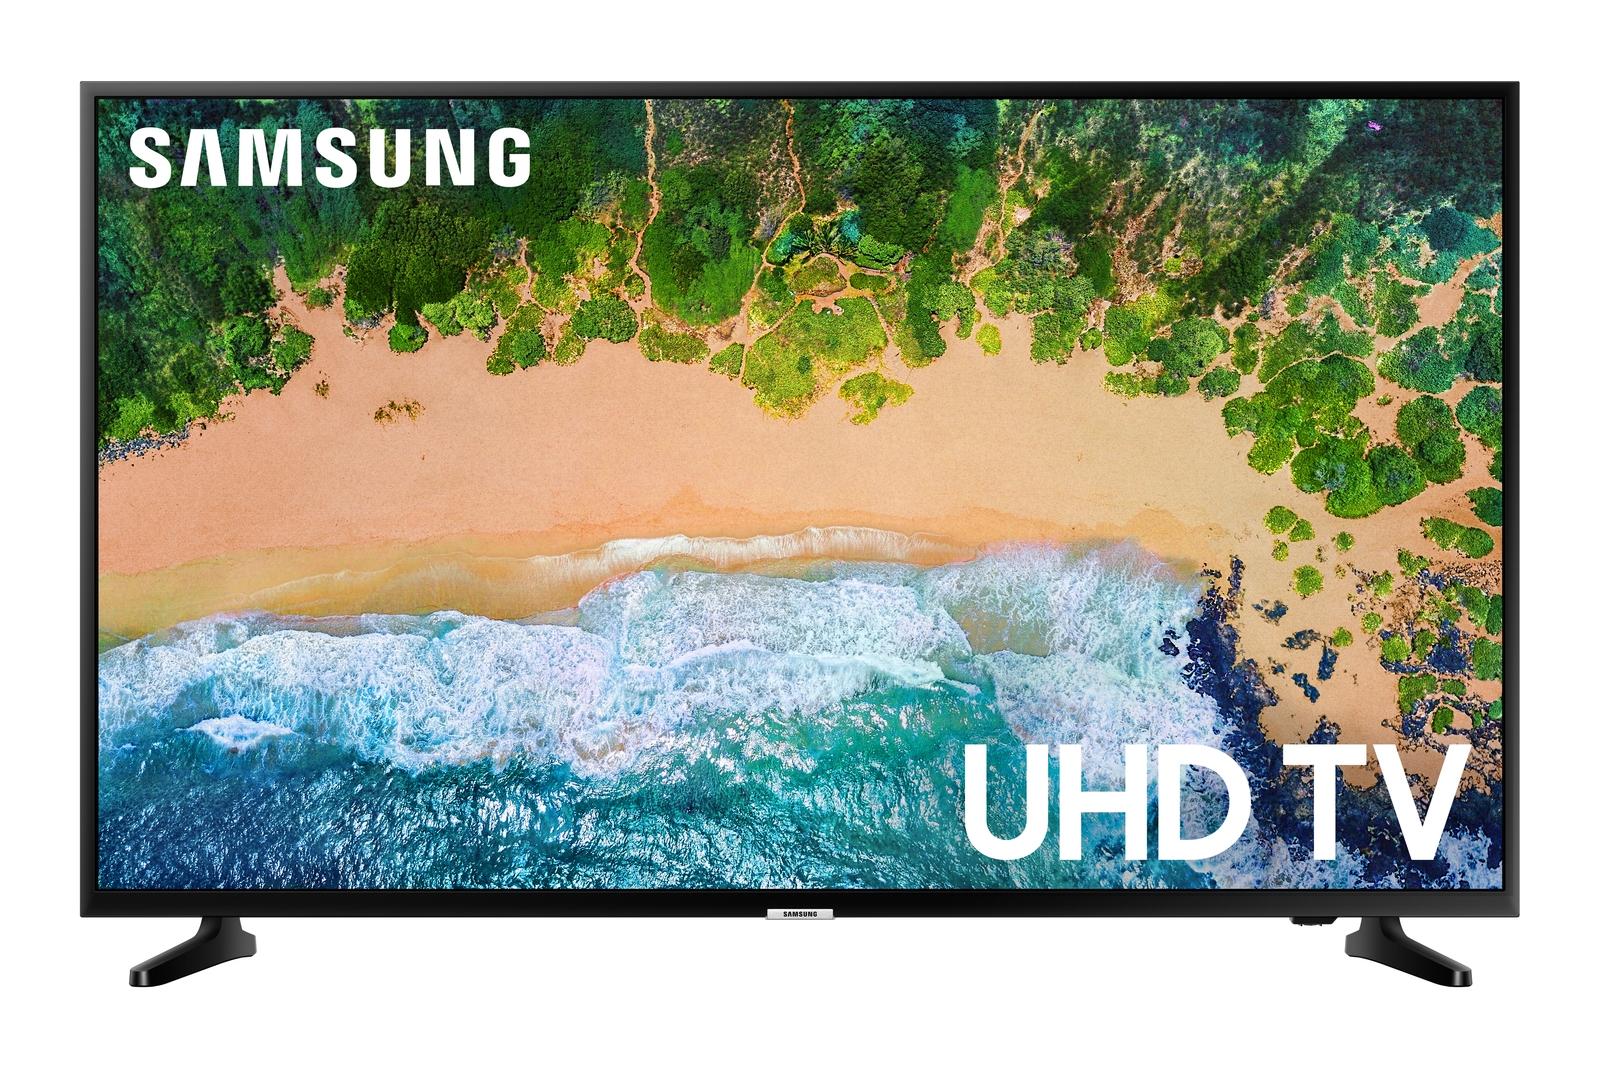 """Samsung 43"""" Class NU6900 Smart 4K UHD TV, CHARCOAL BLACK"""